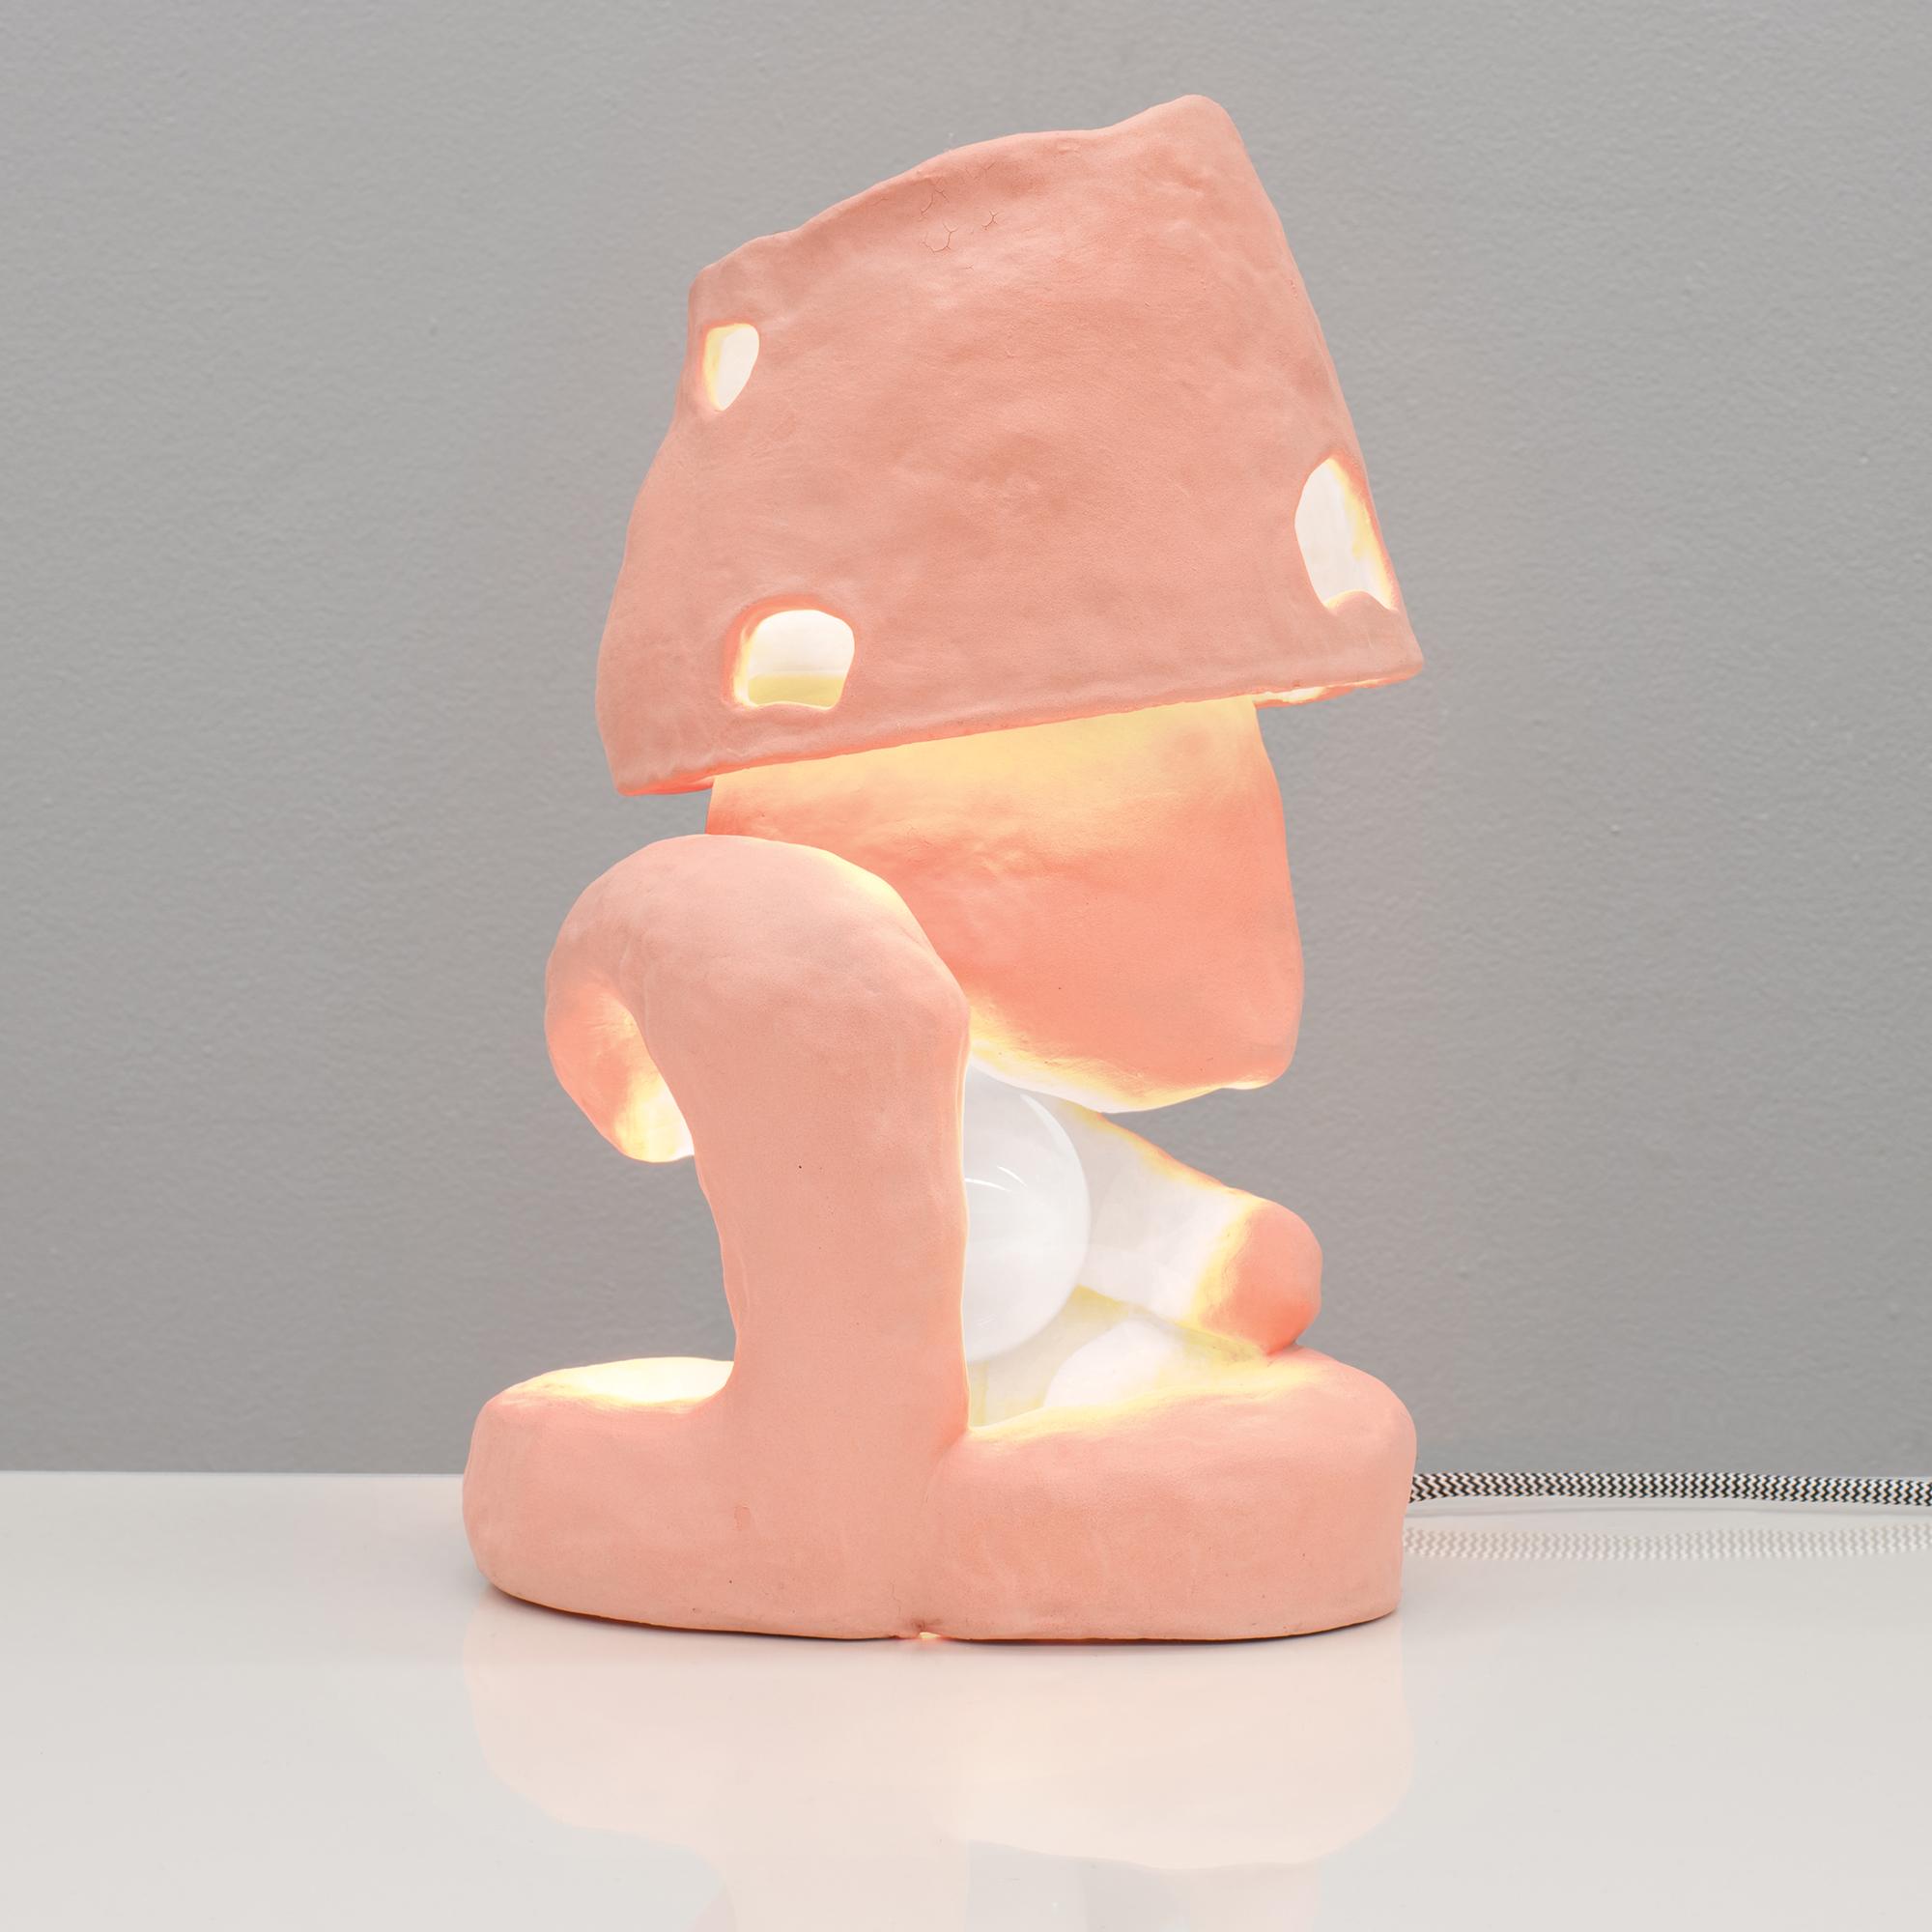 UARK Lamp / NCECA 2019